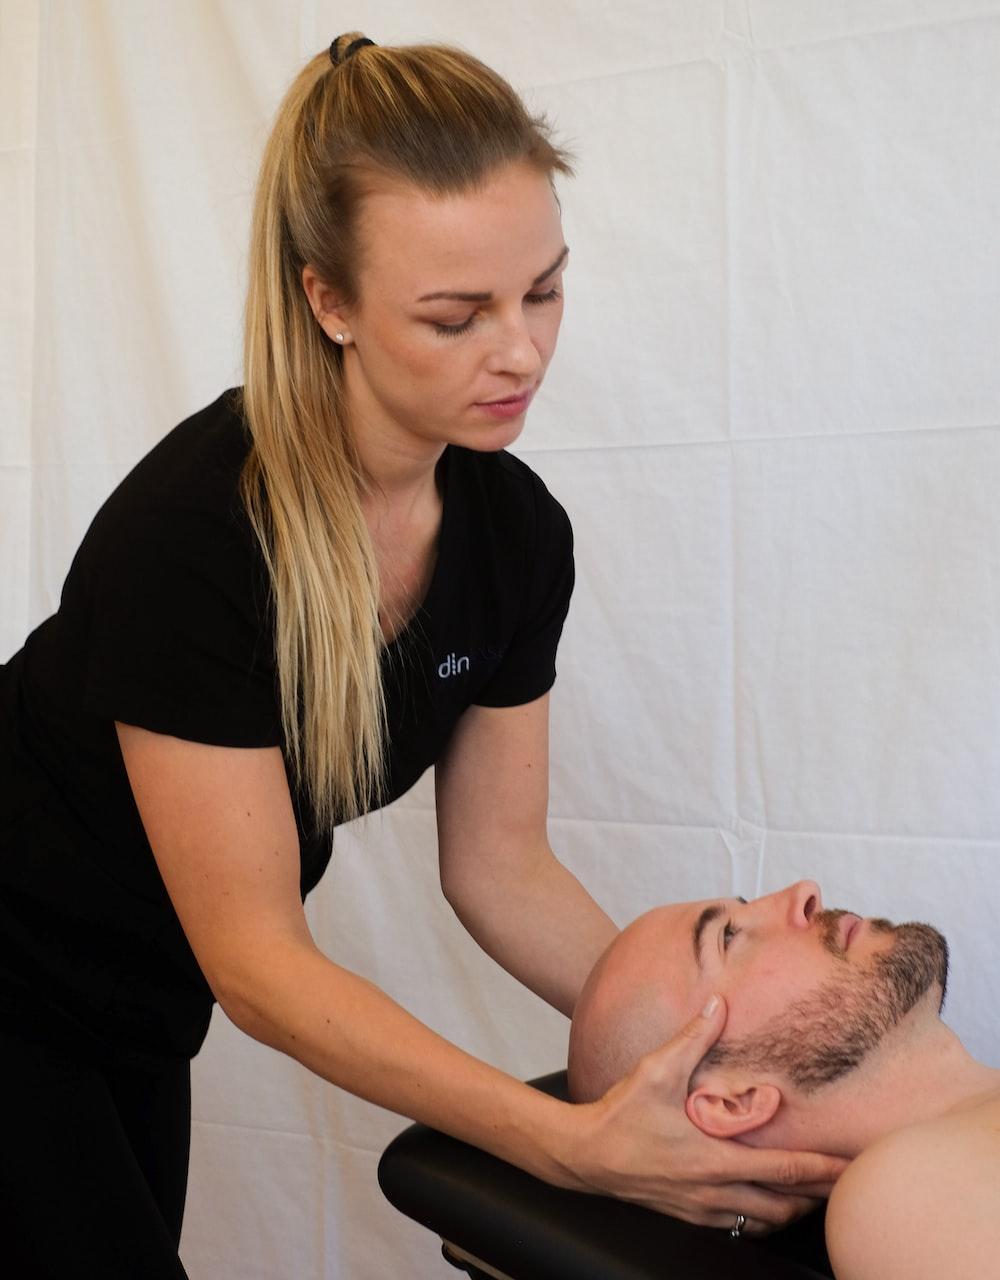 woman massaging man on head